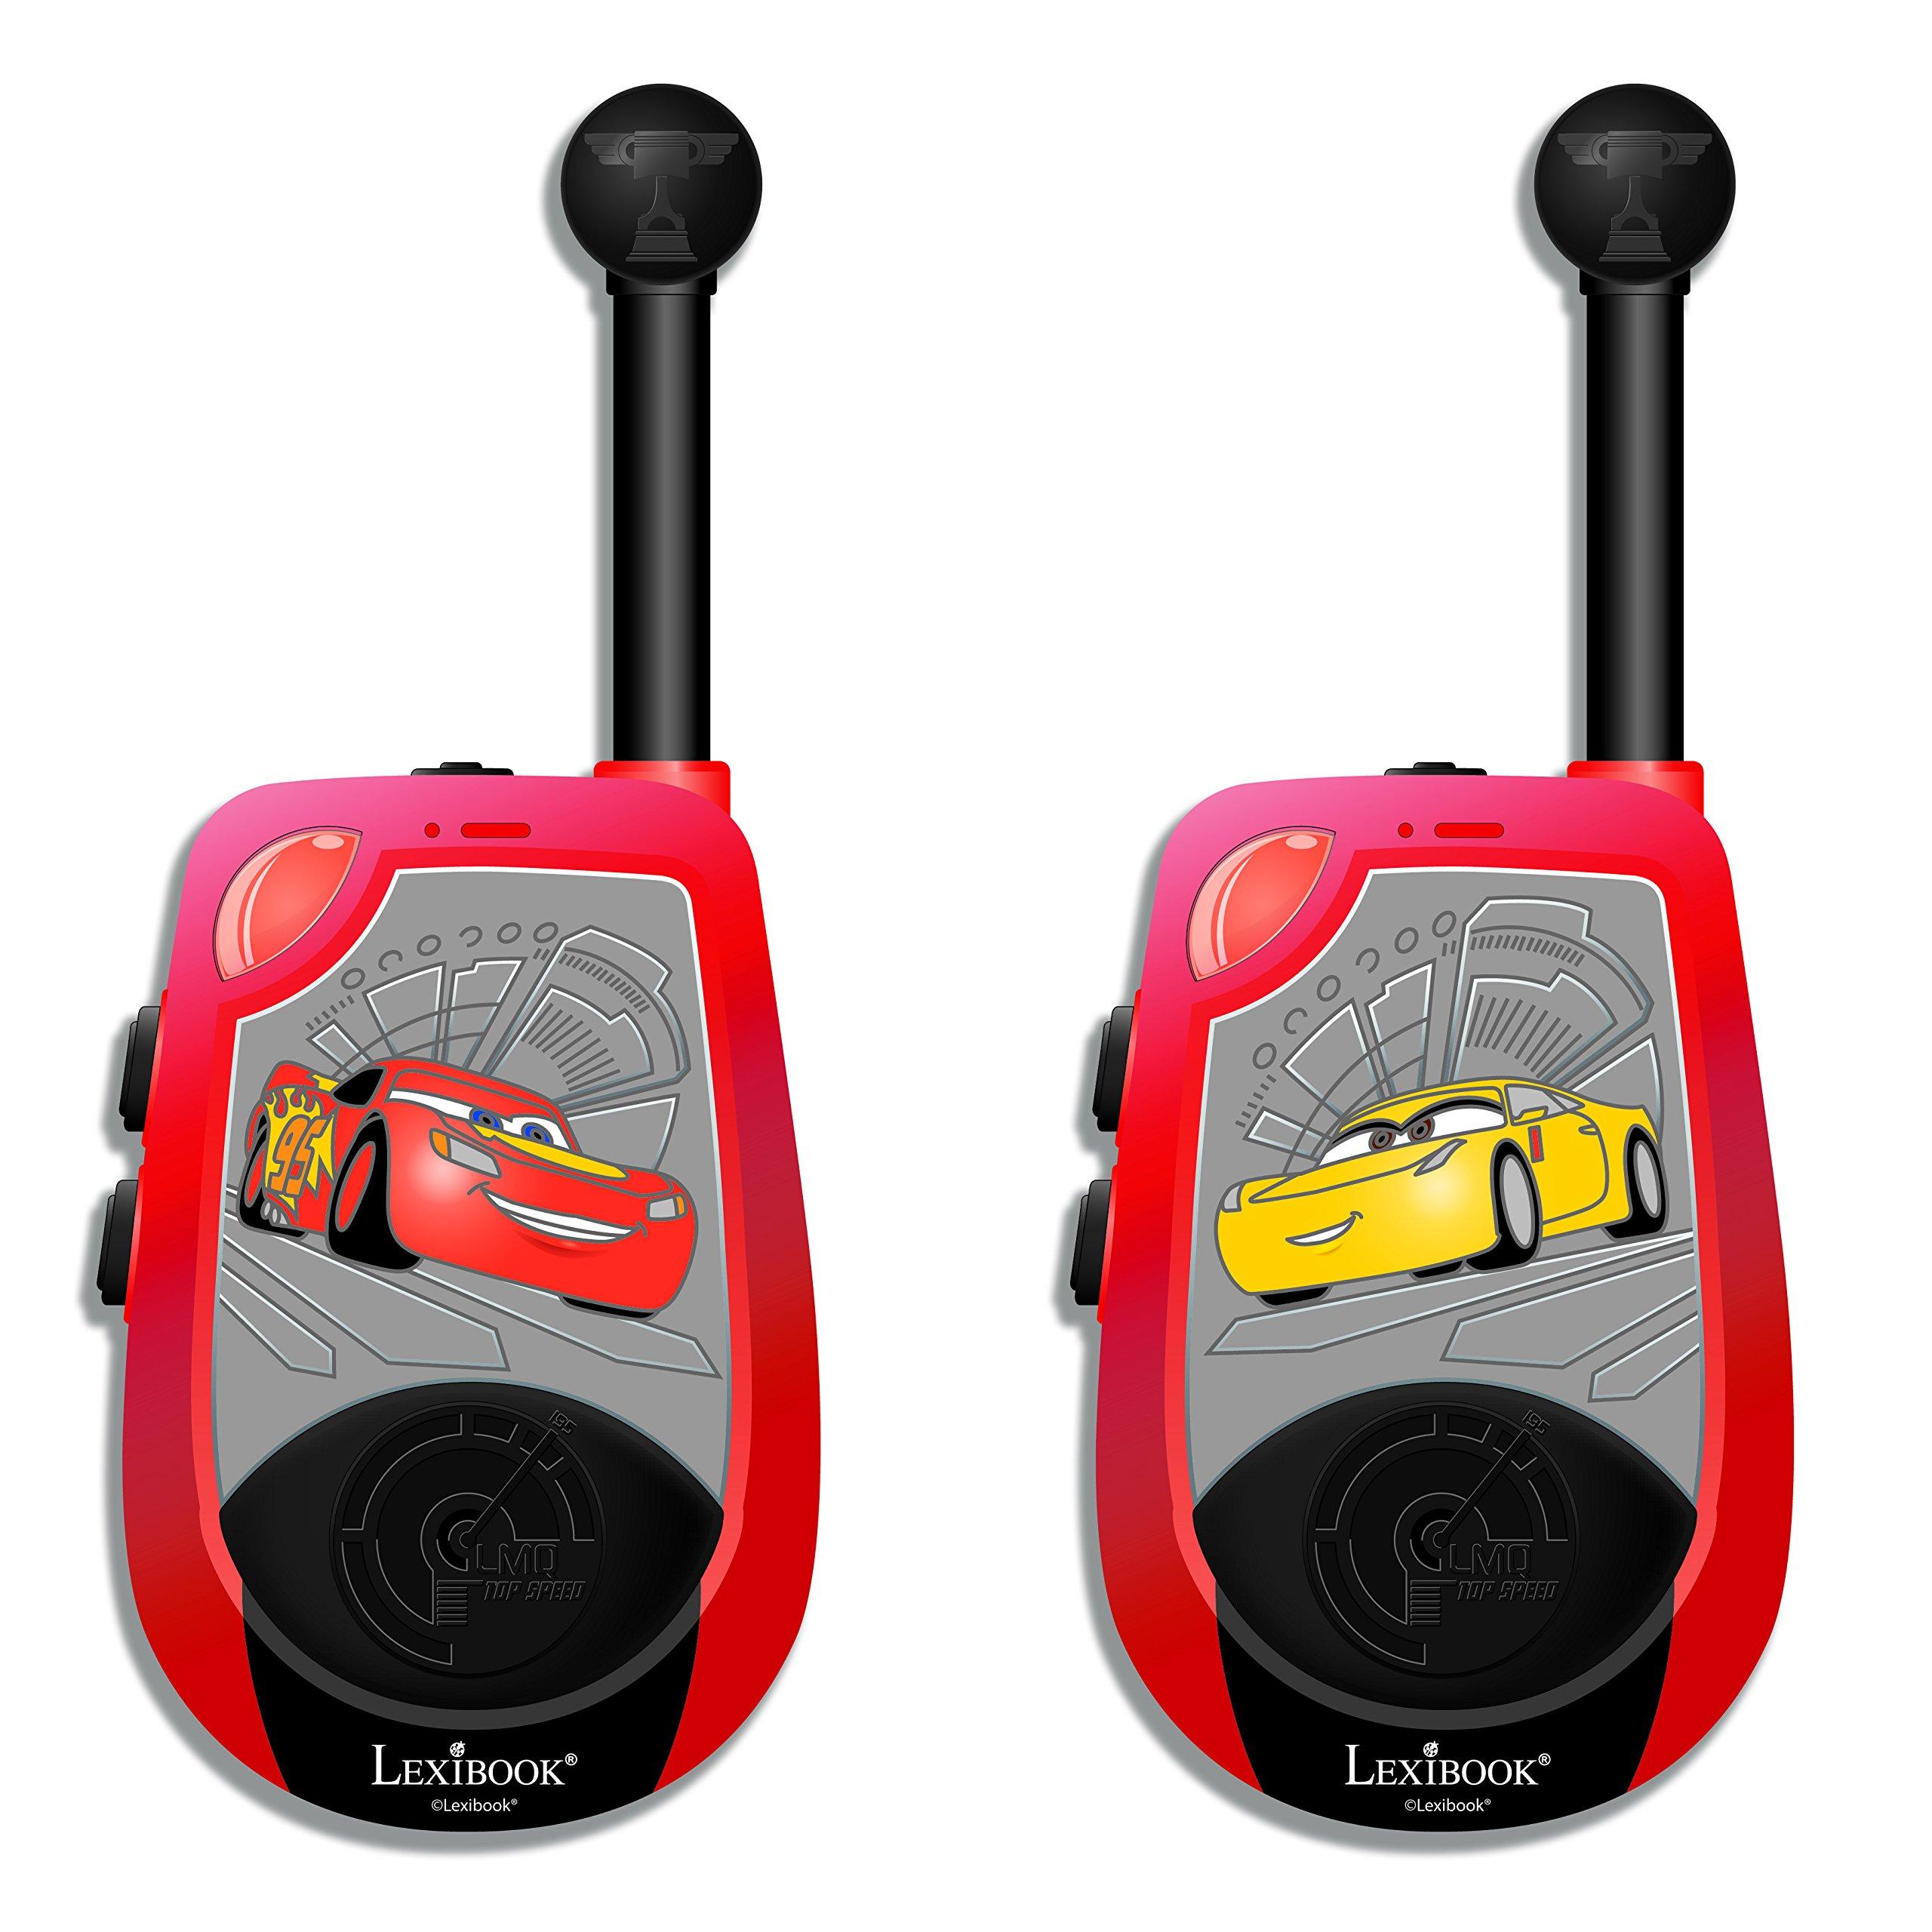 Cars Tw25Dc Disney, Par De Walkie Talkies 3D, Rango de transmisión 2 km, a Partir de 3 años (Lexibook